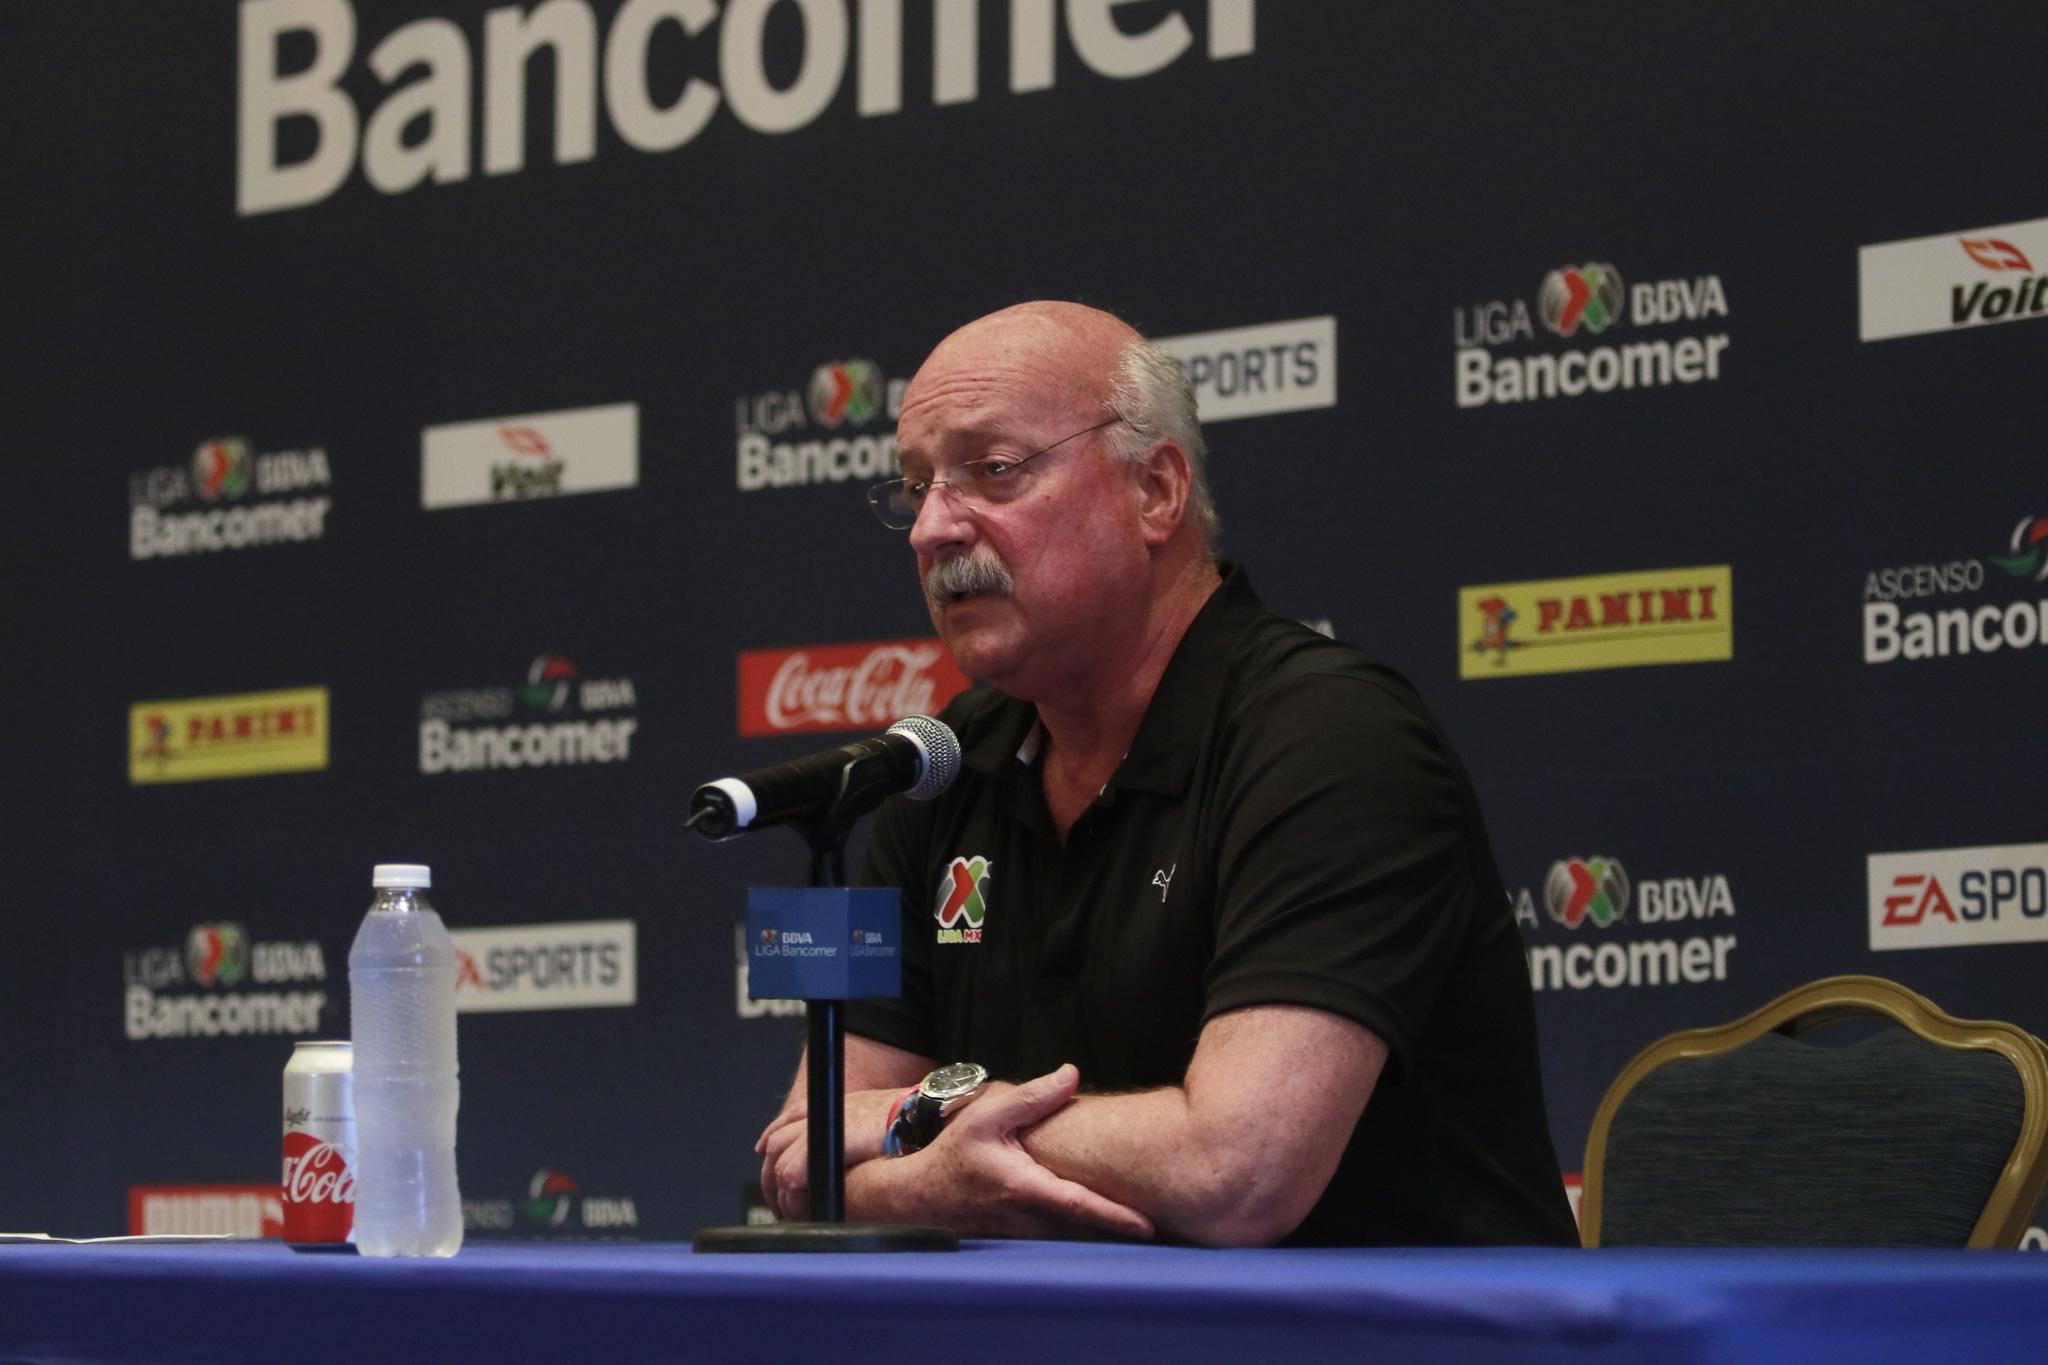 Enrique Bonilla, con el útimo informe del Draft, del Ascenso MX.